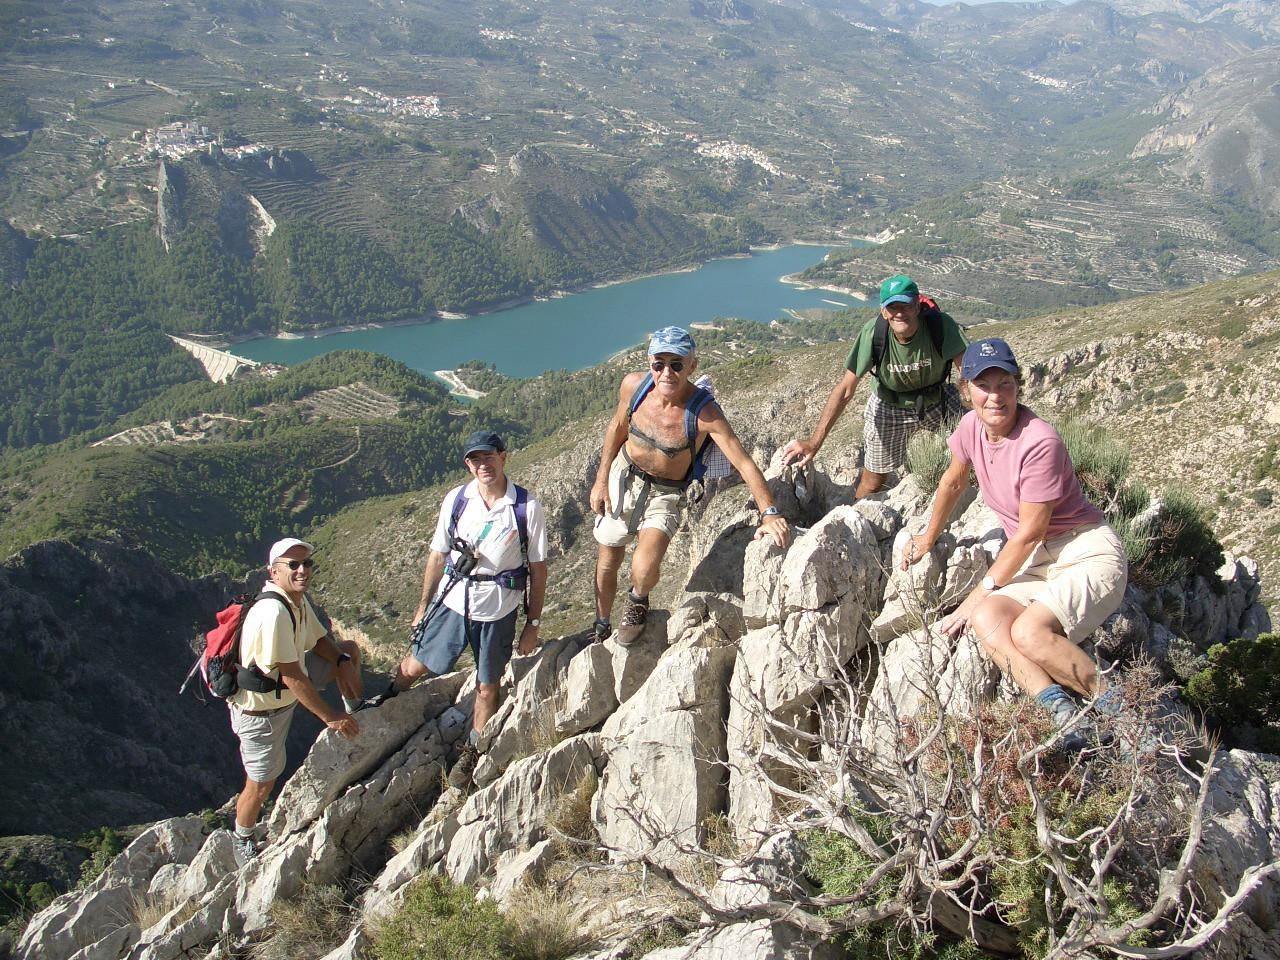 Guadalest to Aixorta scramble